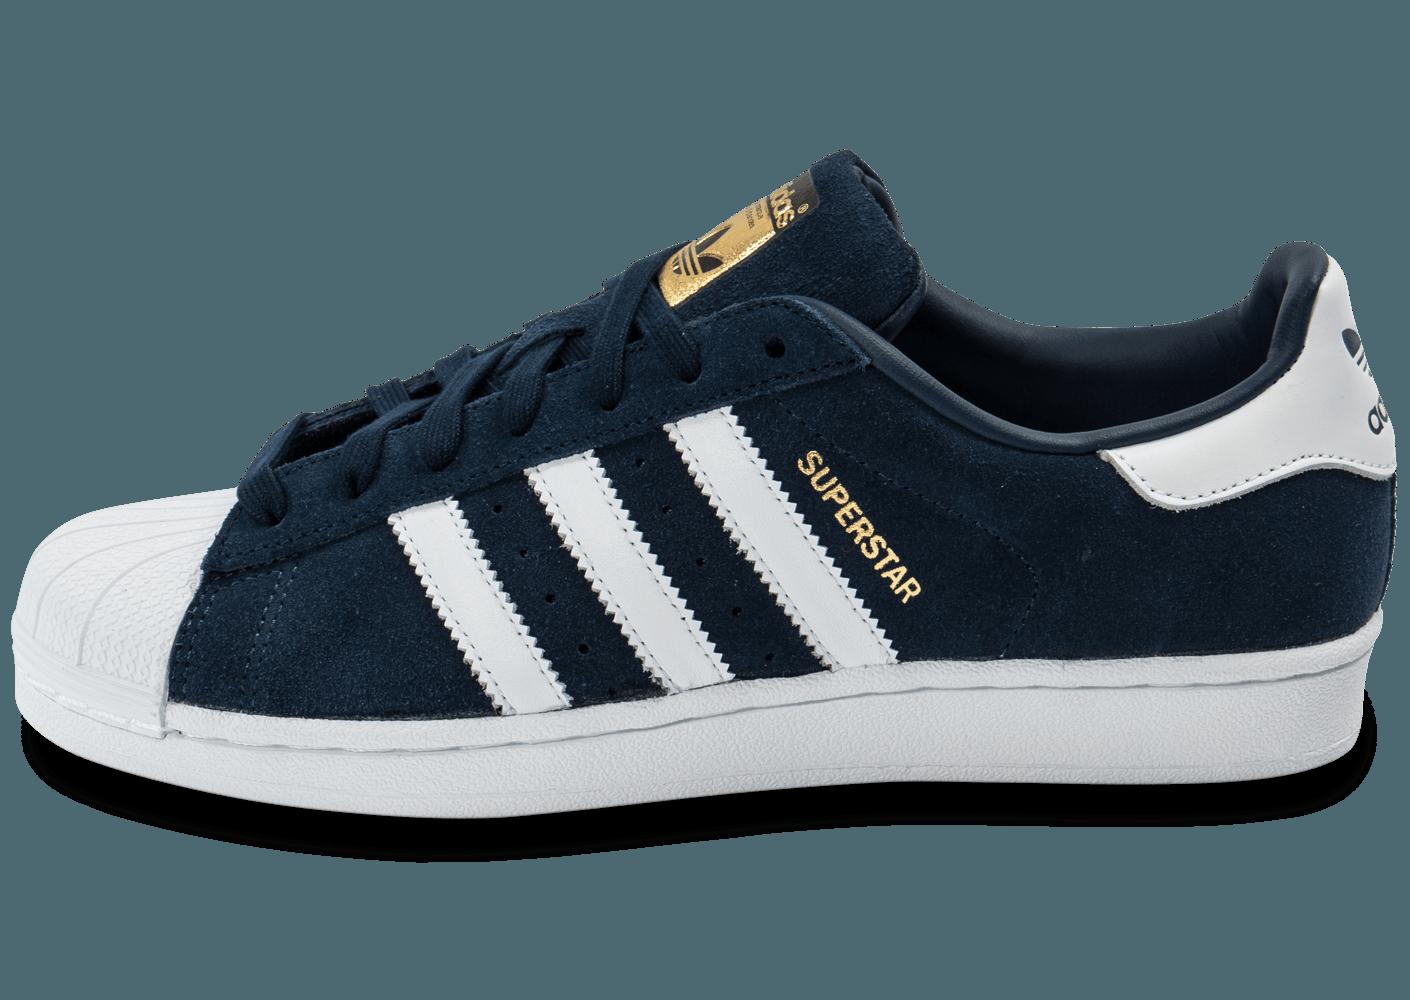 new style 1db6b 0492f adidas superstar bleu marine